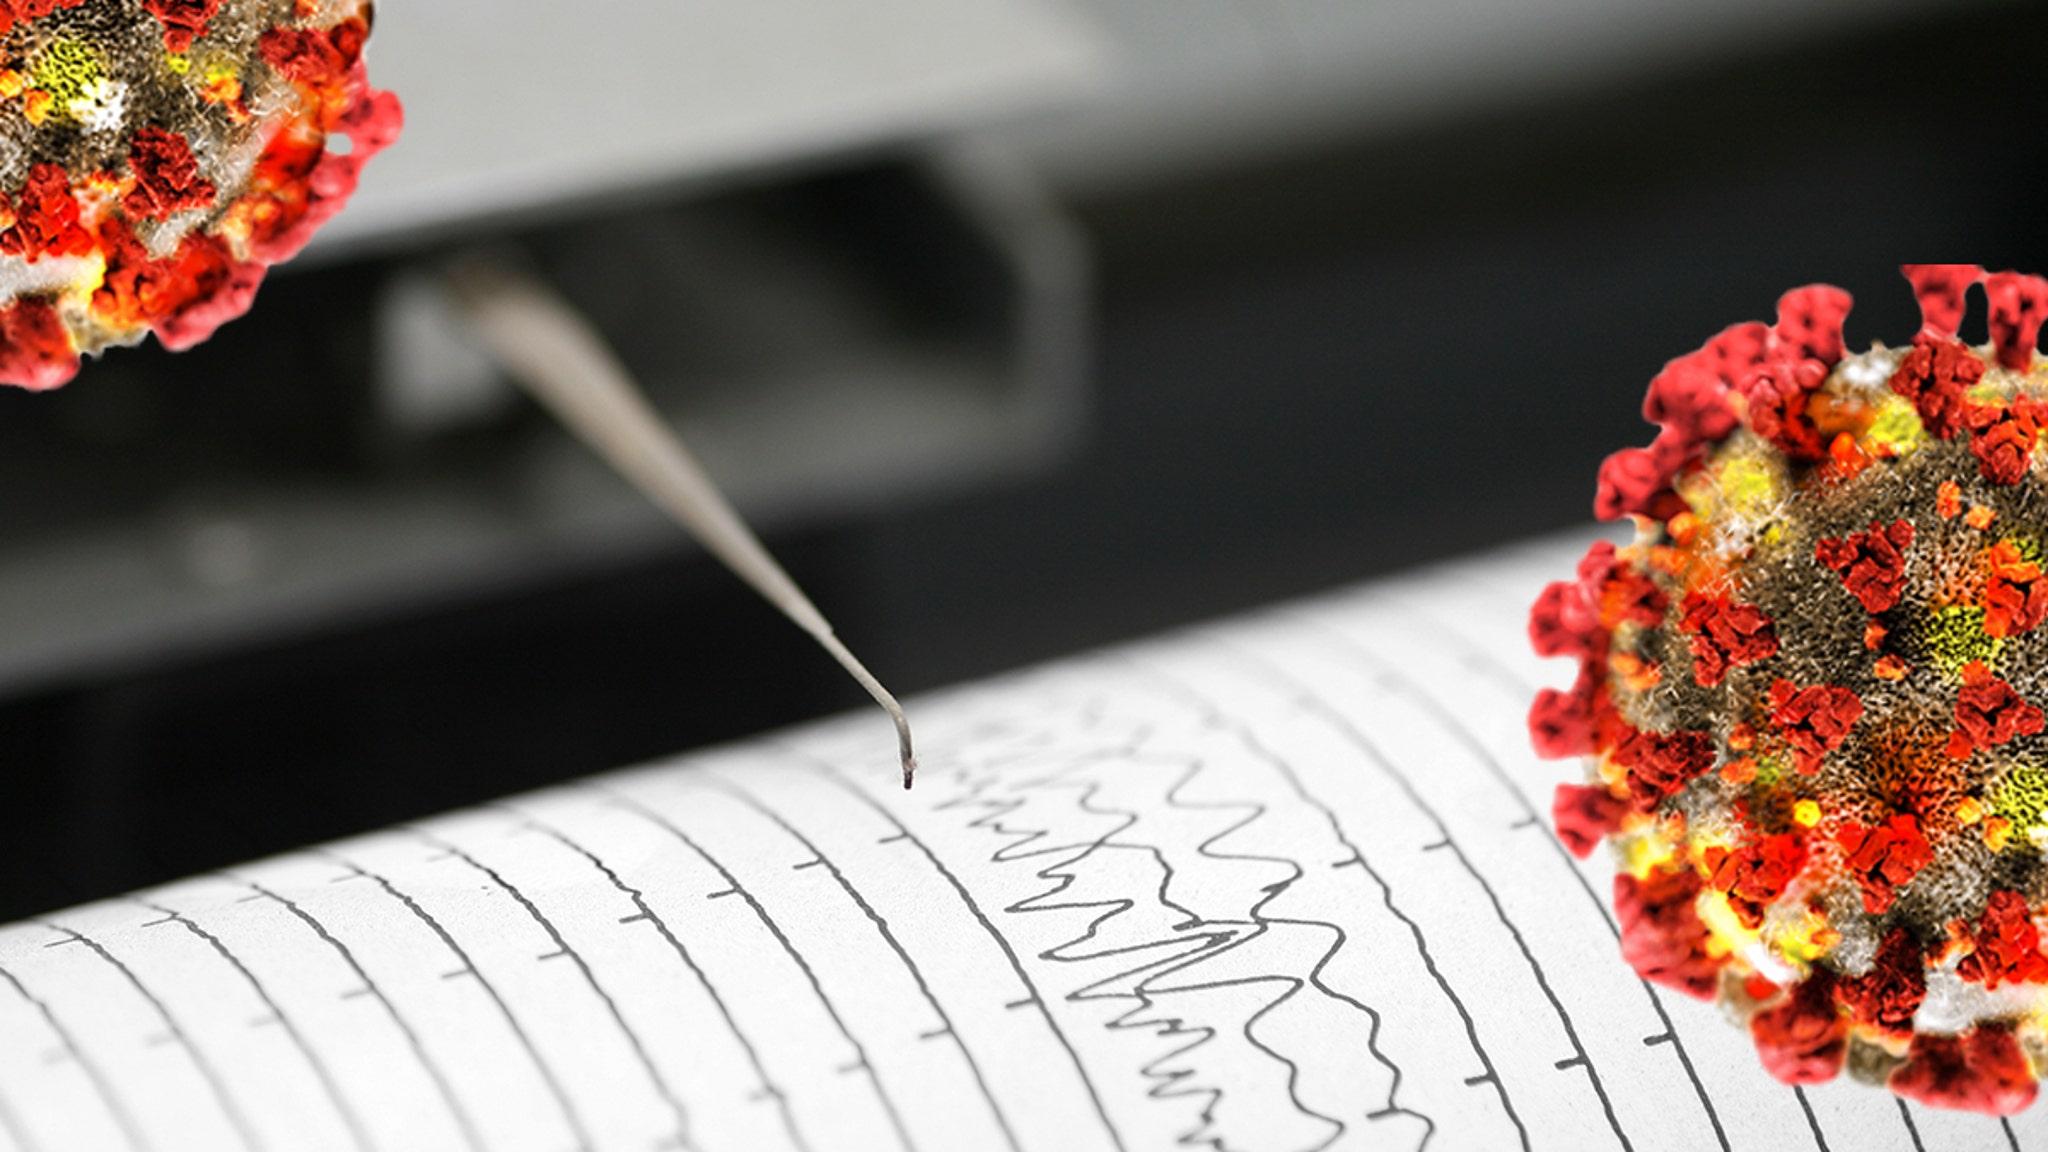 Coronavirus Has Made the Earth Quieter, Seismologists Say